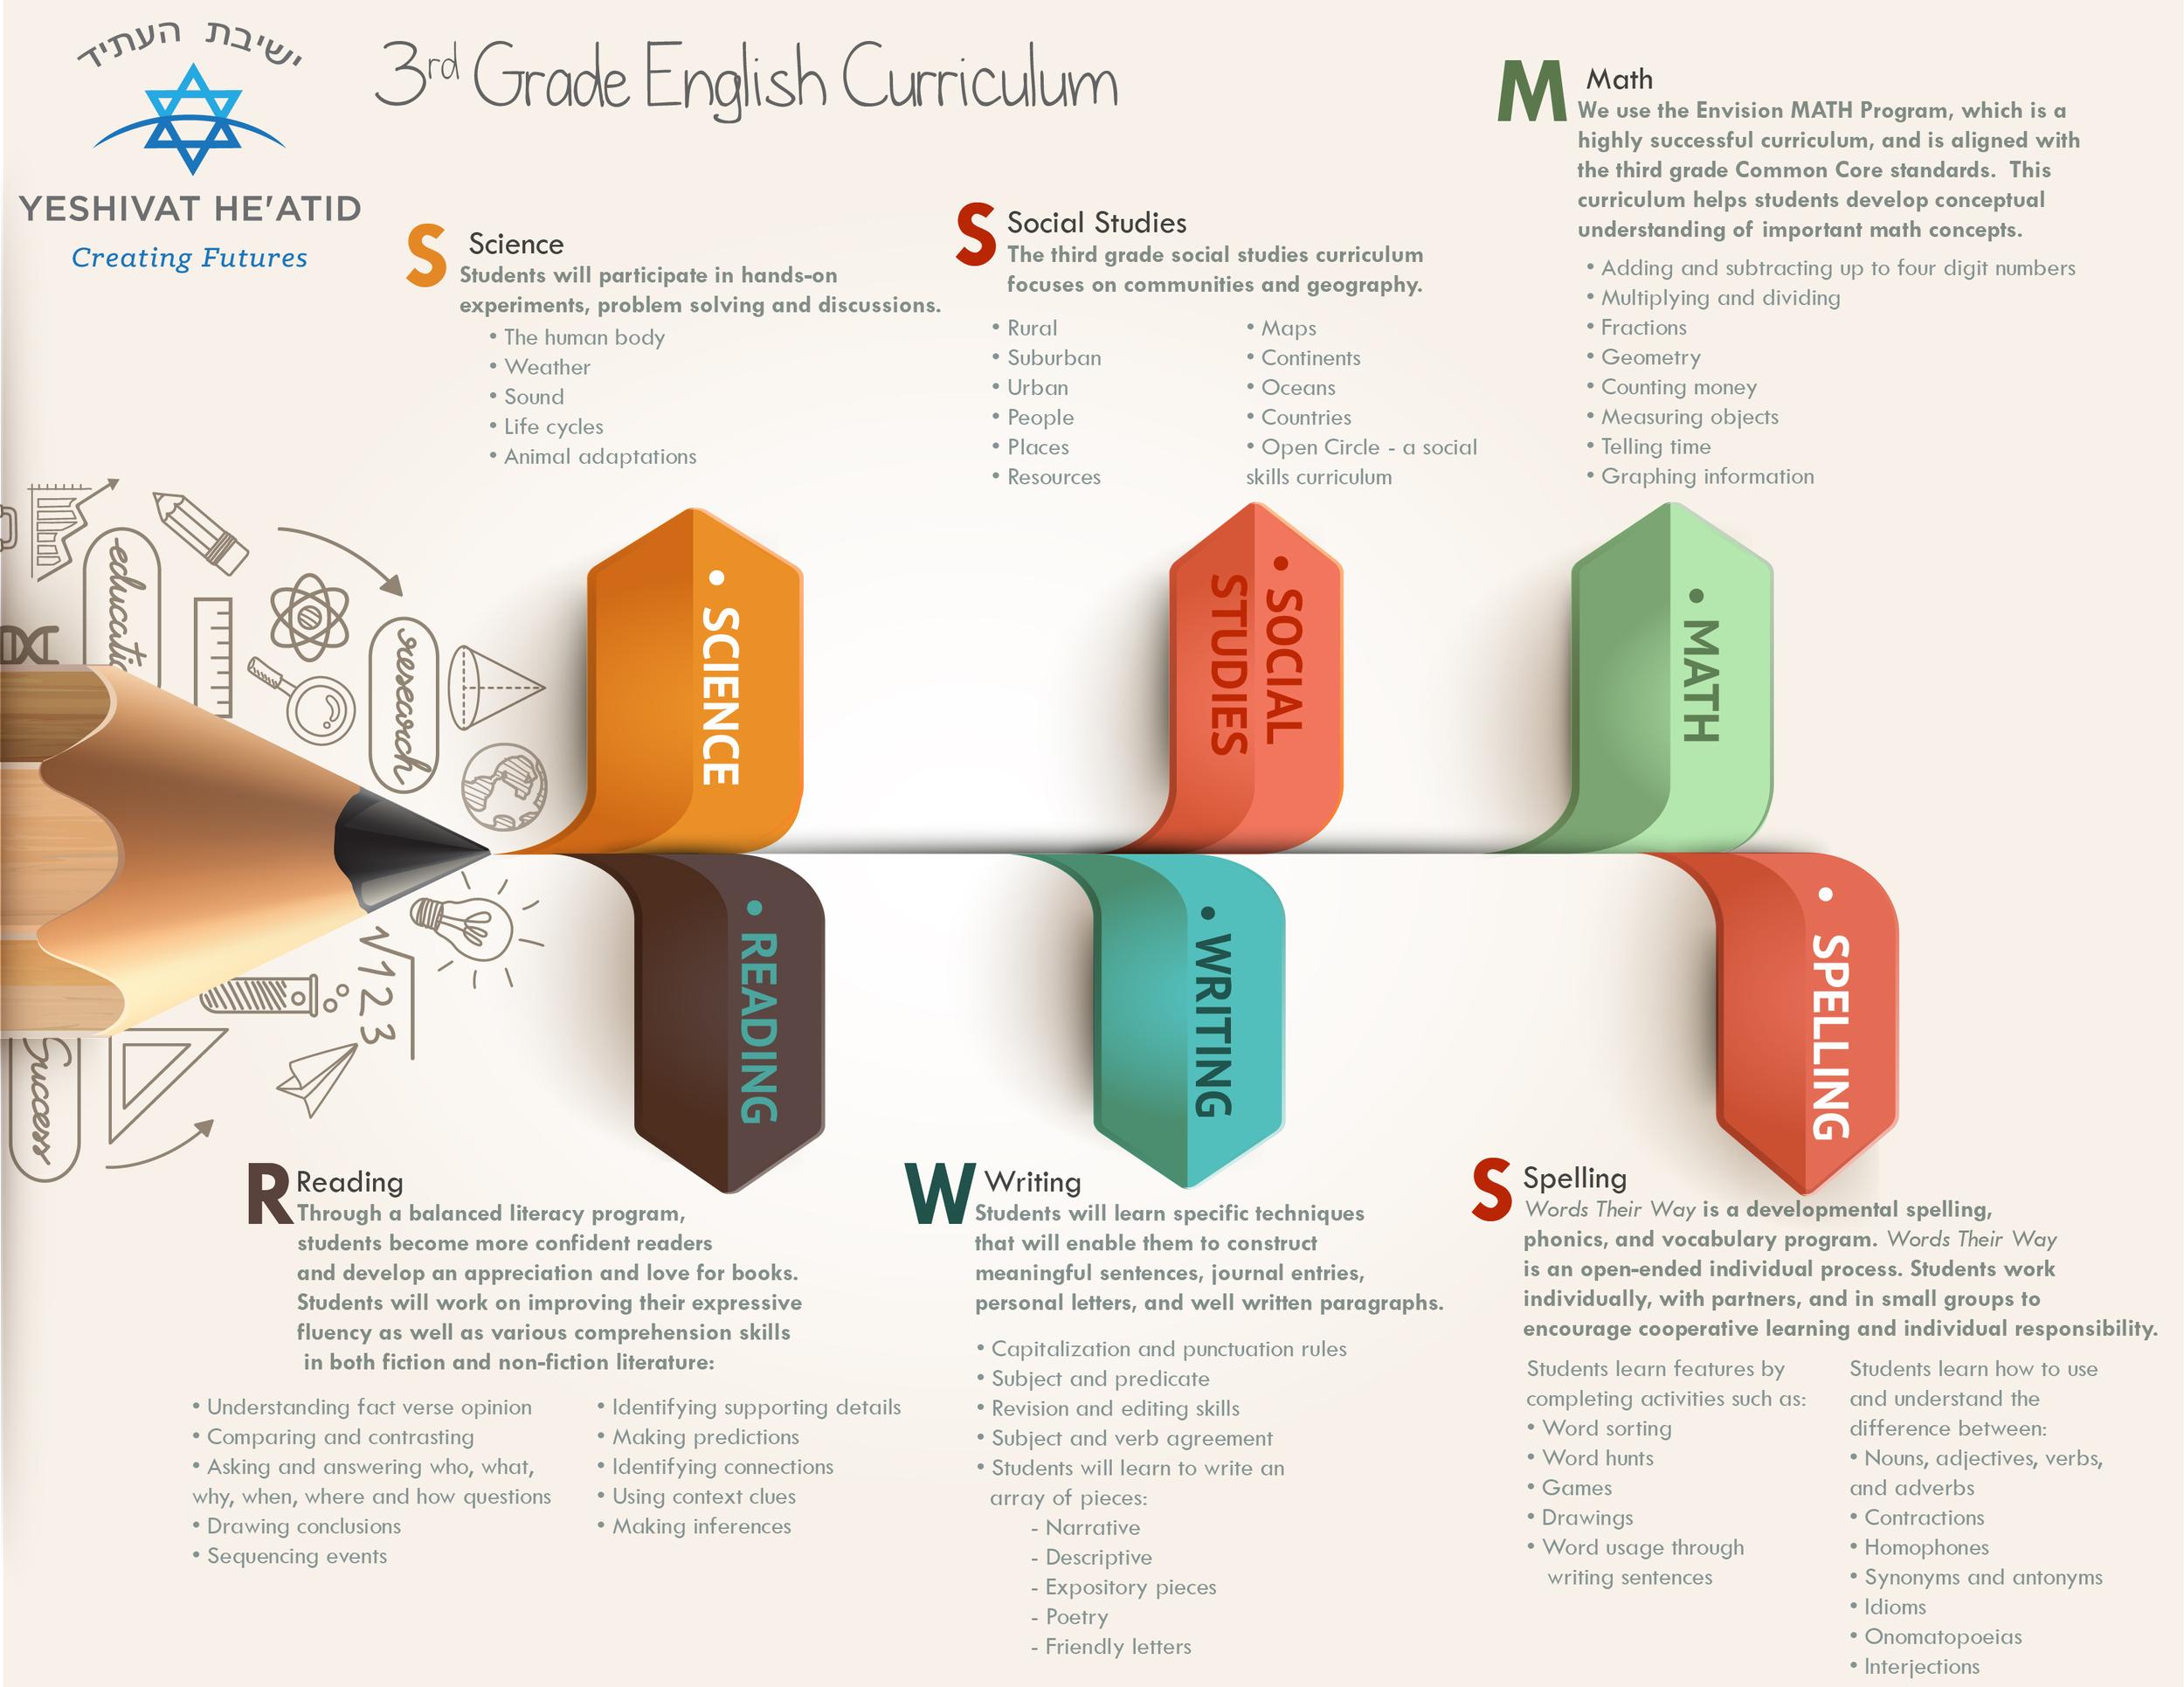 7- 3rd Grade English Curriculum.jpg